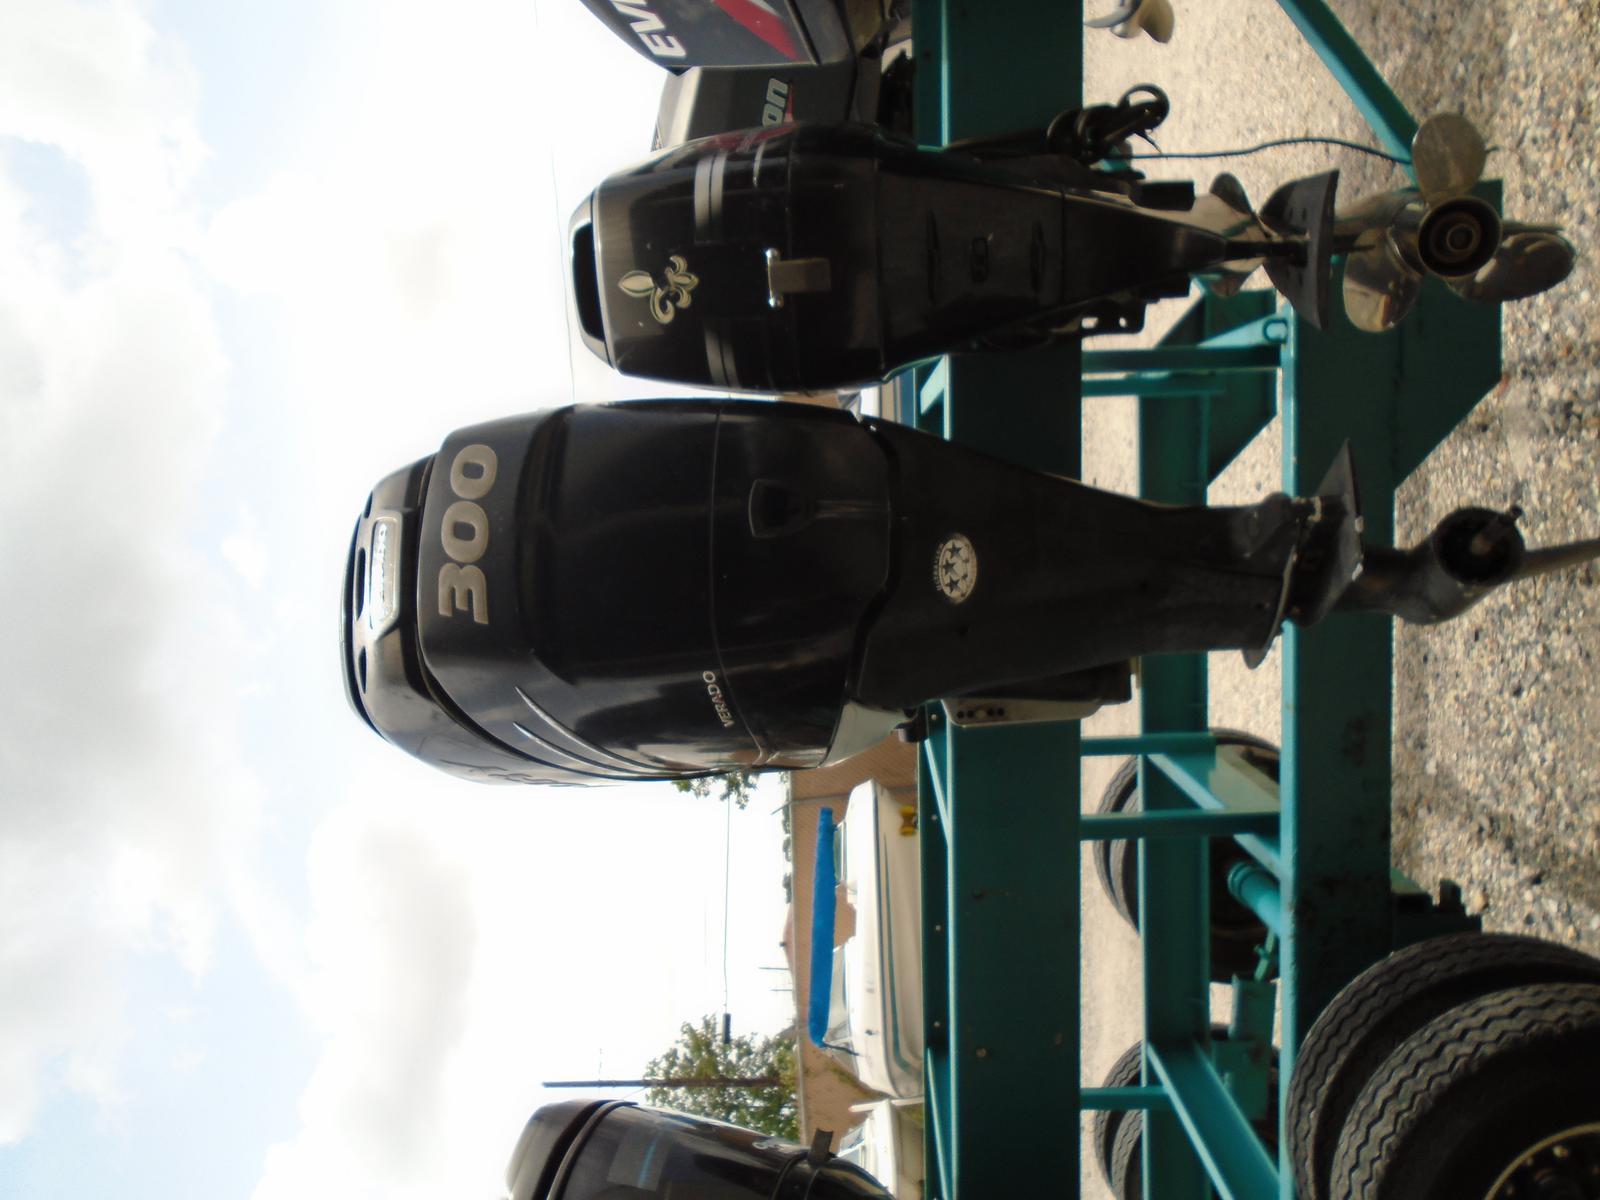 New  2006 Mercury Marine Engines Outboard Motors Outboard in Marrero, Louisiana